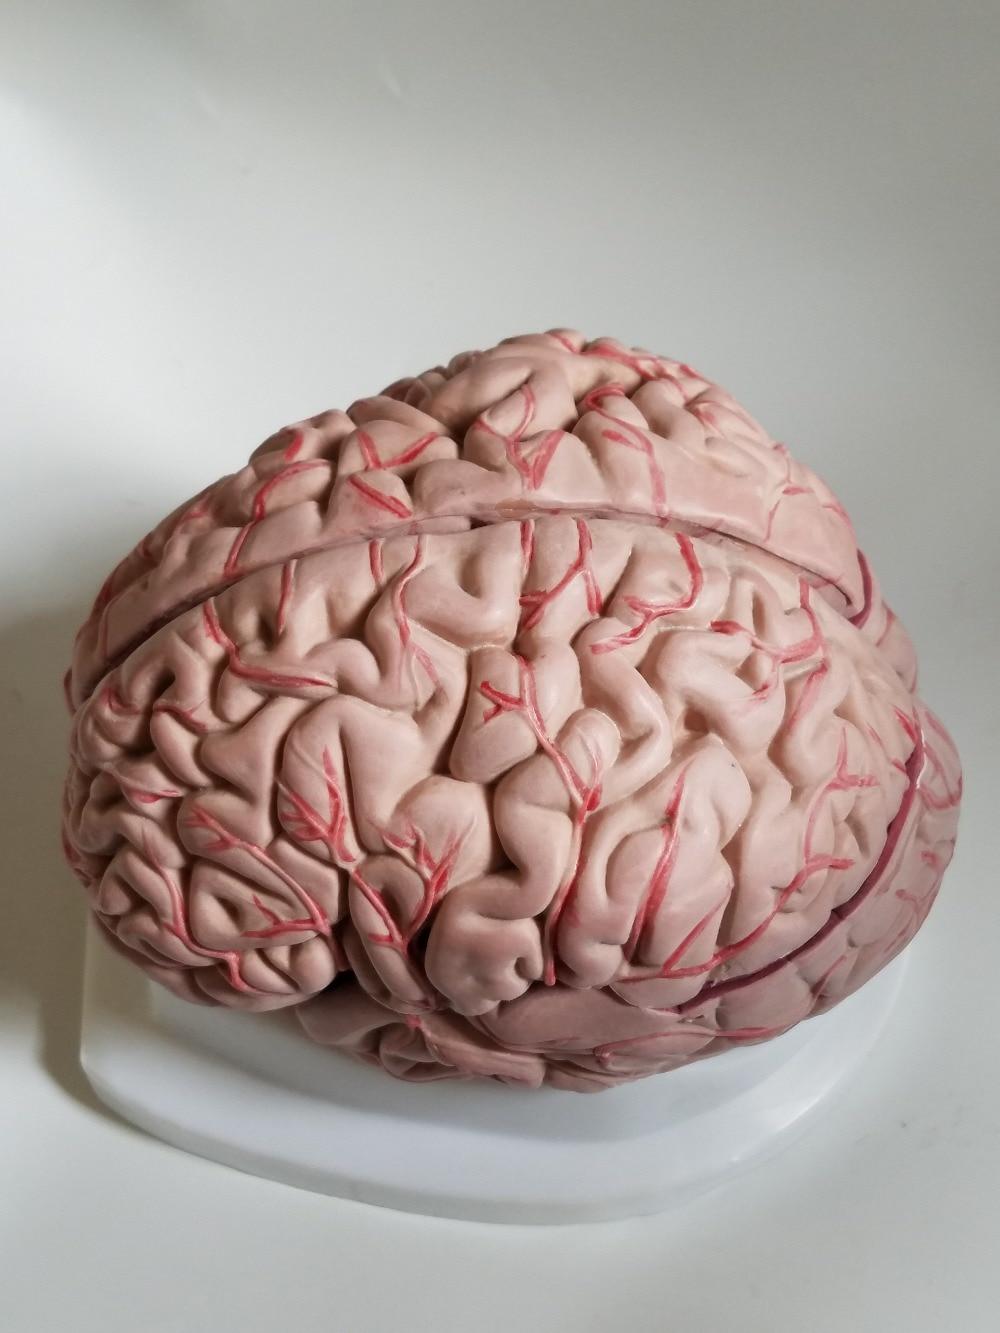 Human Brain Model Cerebrovascular Model 8 Parts Brain Anatomy Model Medical Science Teaching Model Educational Supplies